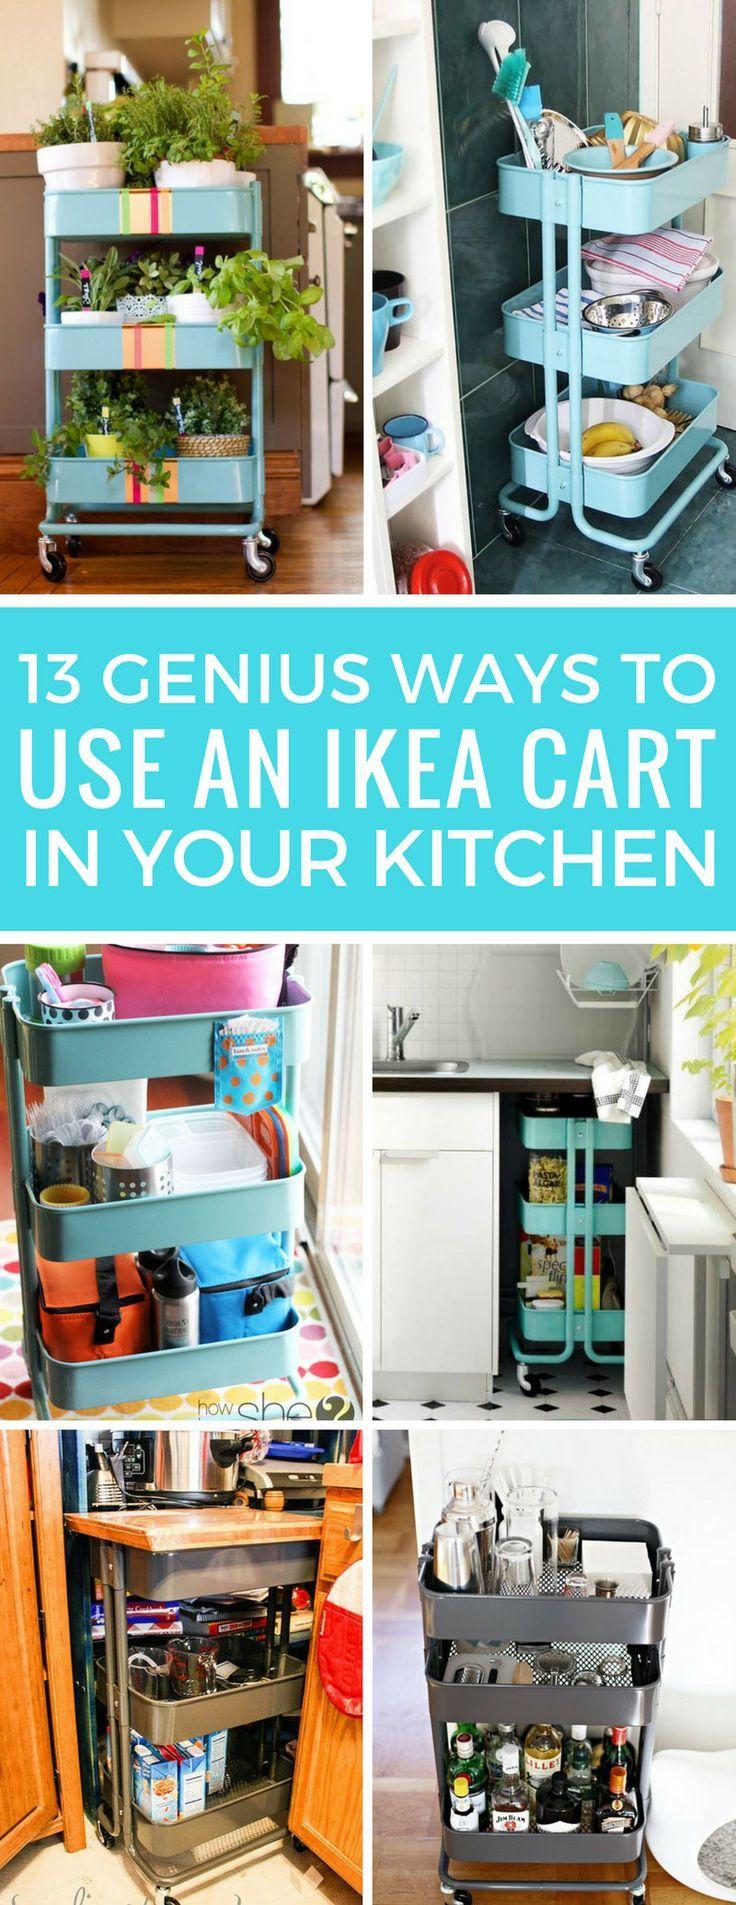 13 Super Clever IKEA Raskog Cart Uses